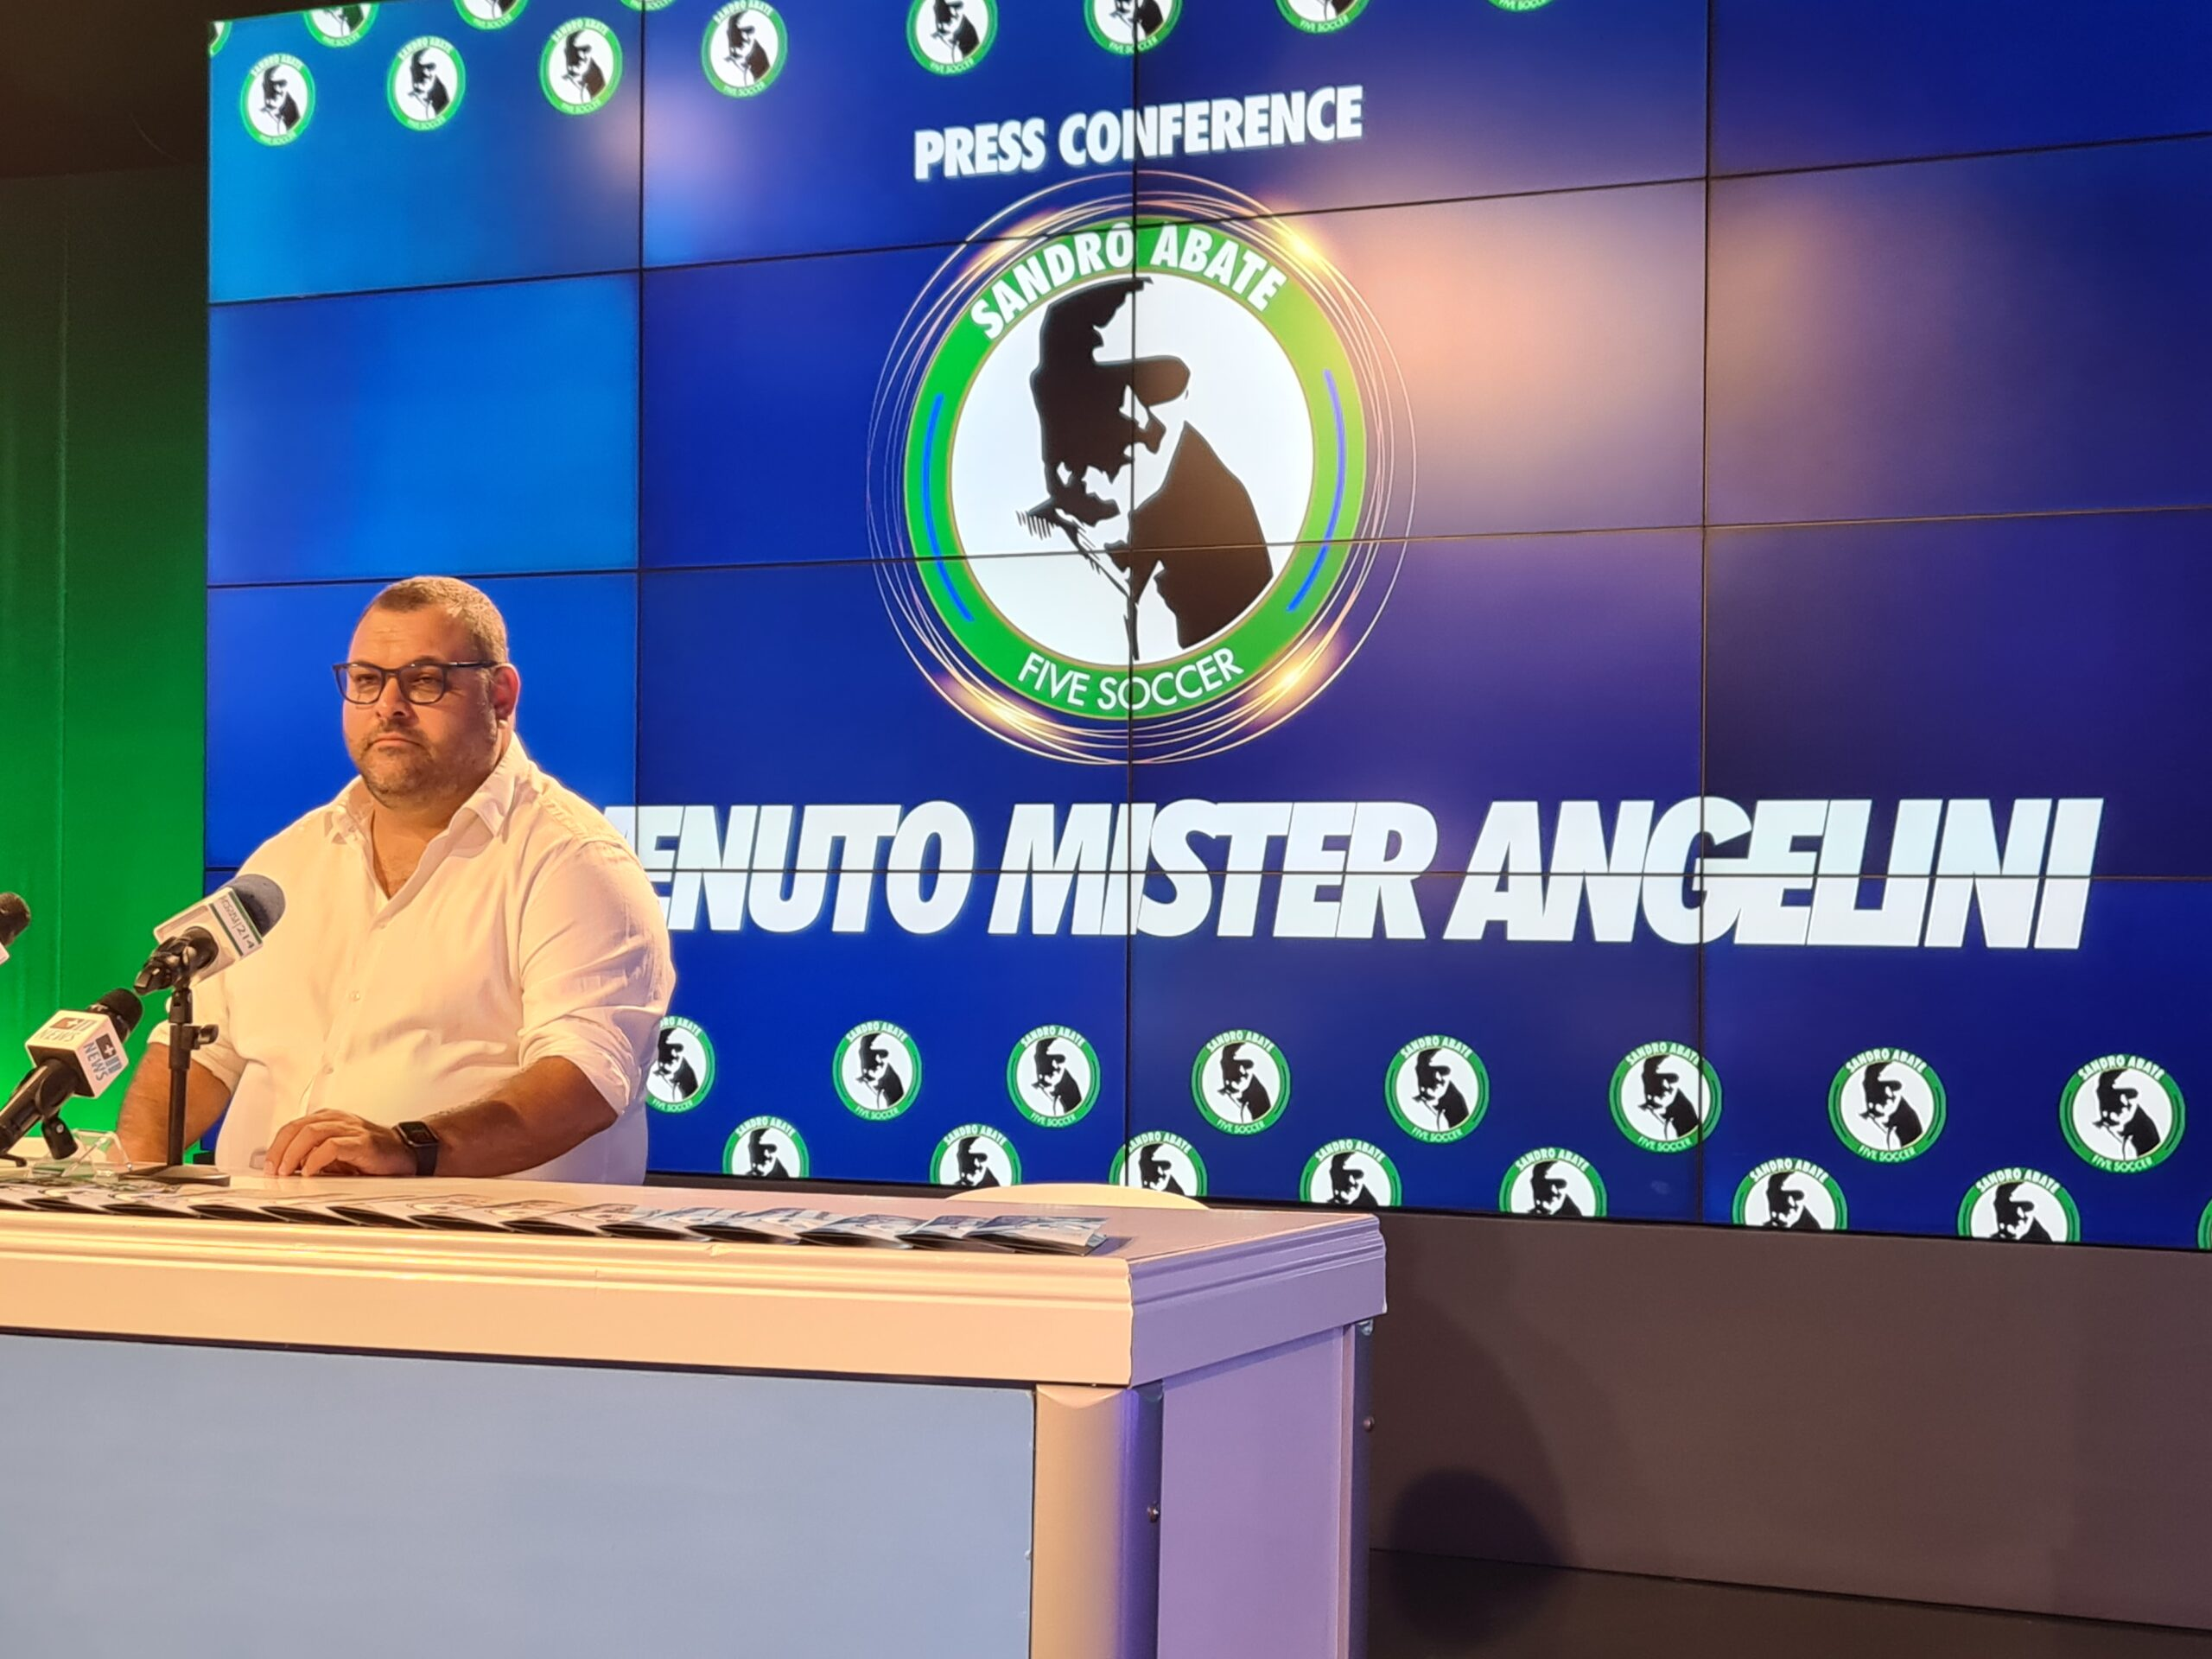 Ciccio Angelini